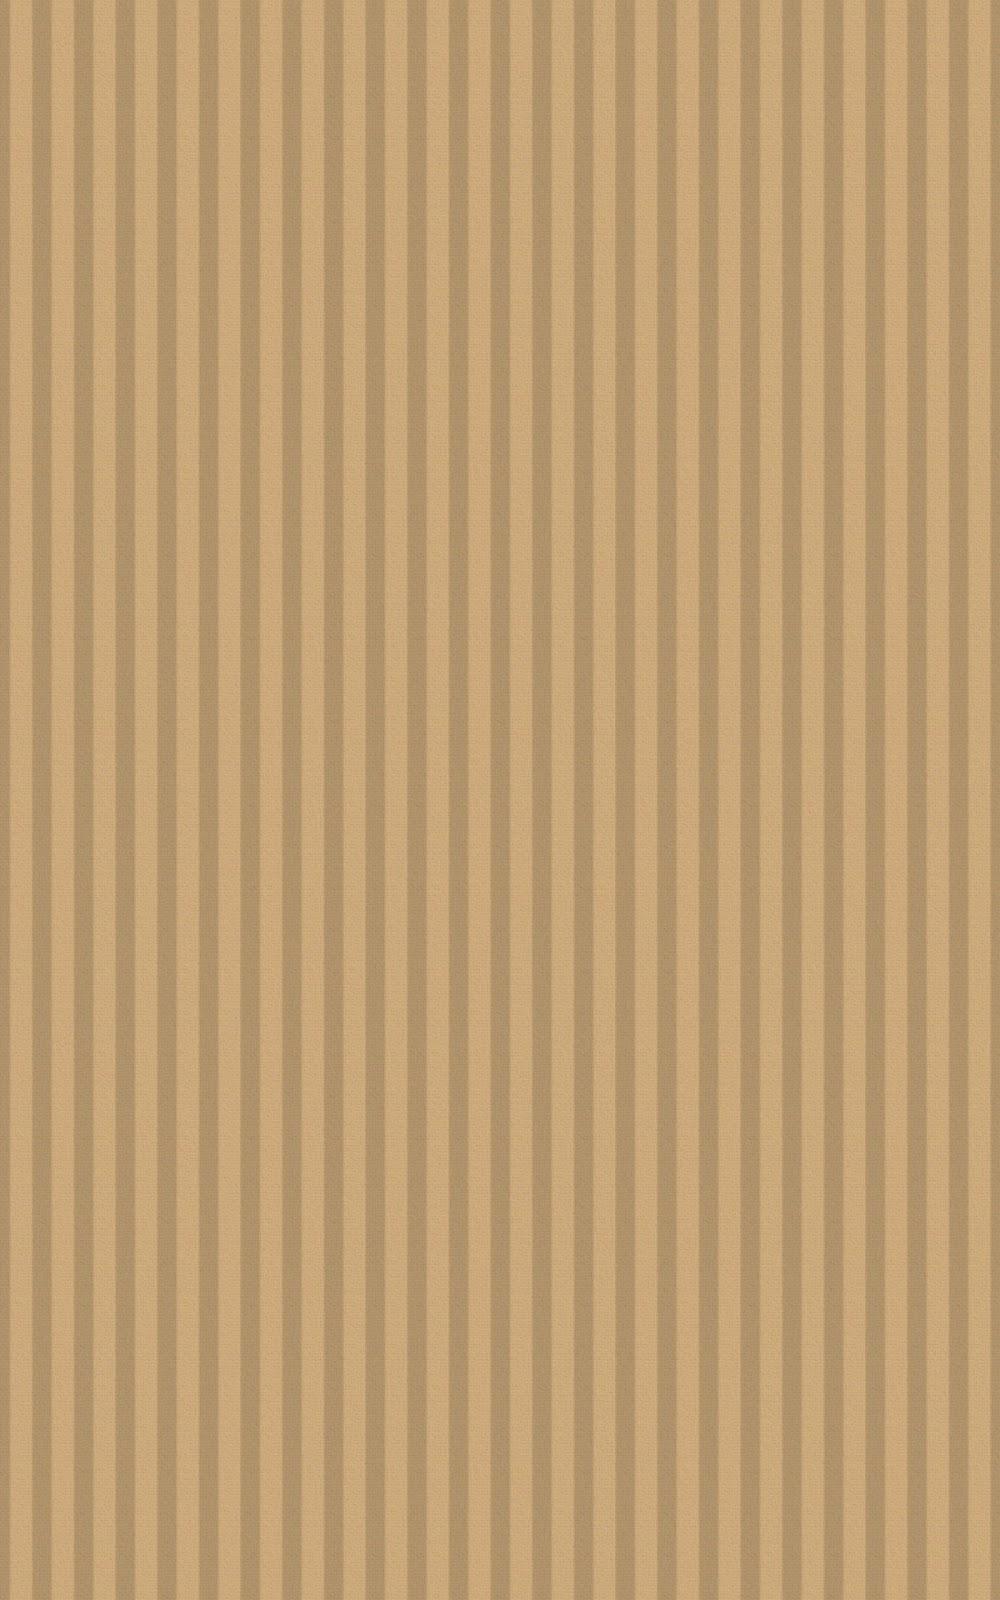 Download Kindle Fire HD 89 Wallpaper 02   1200x1920 1000x1600